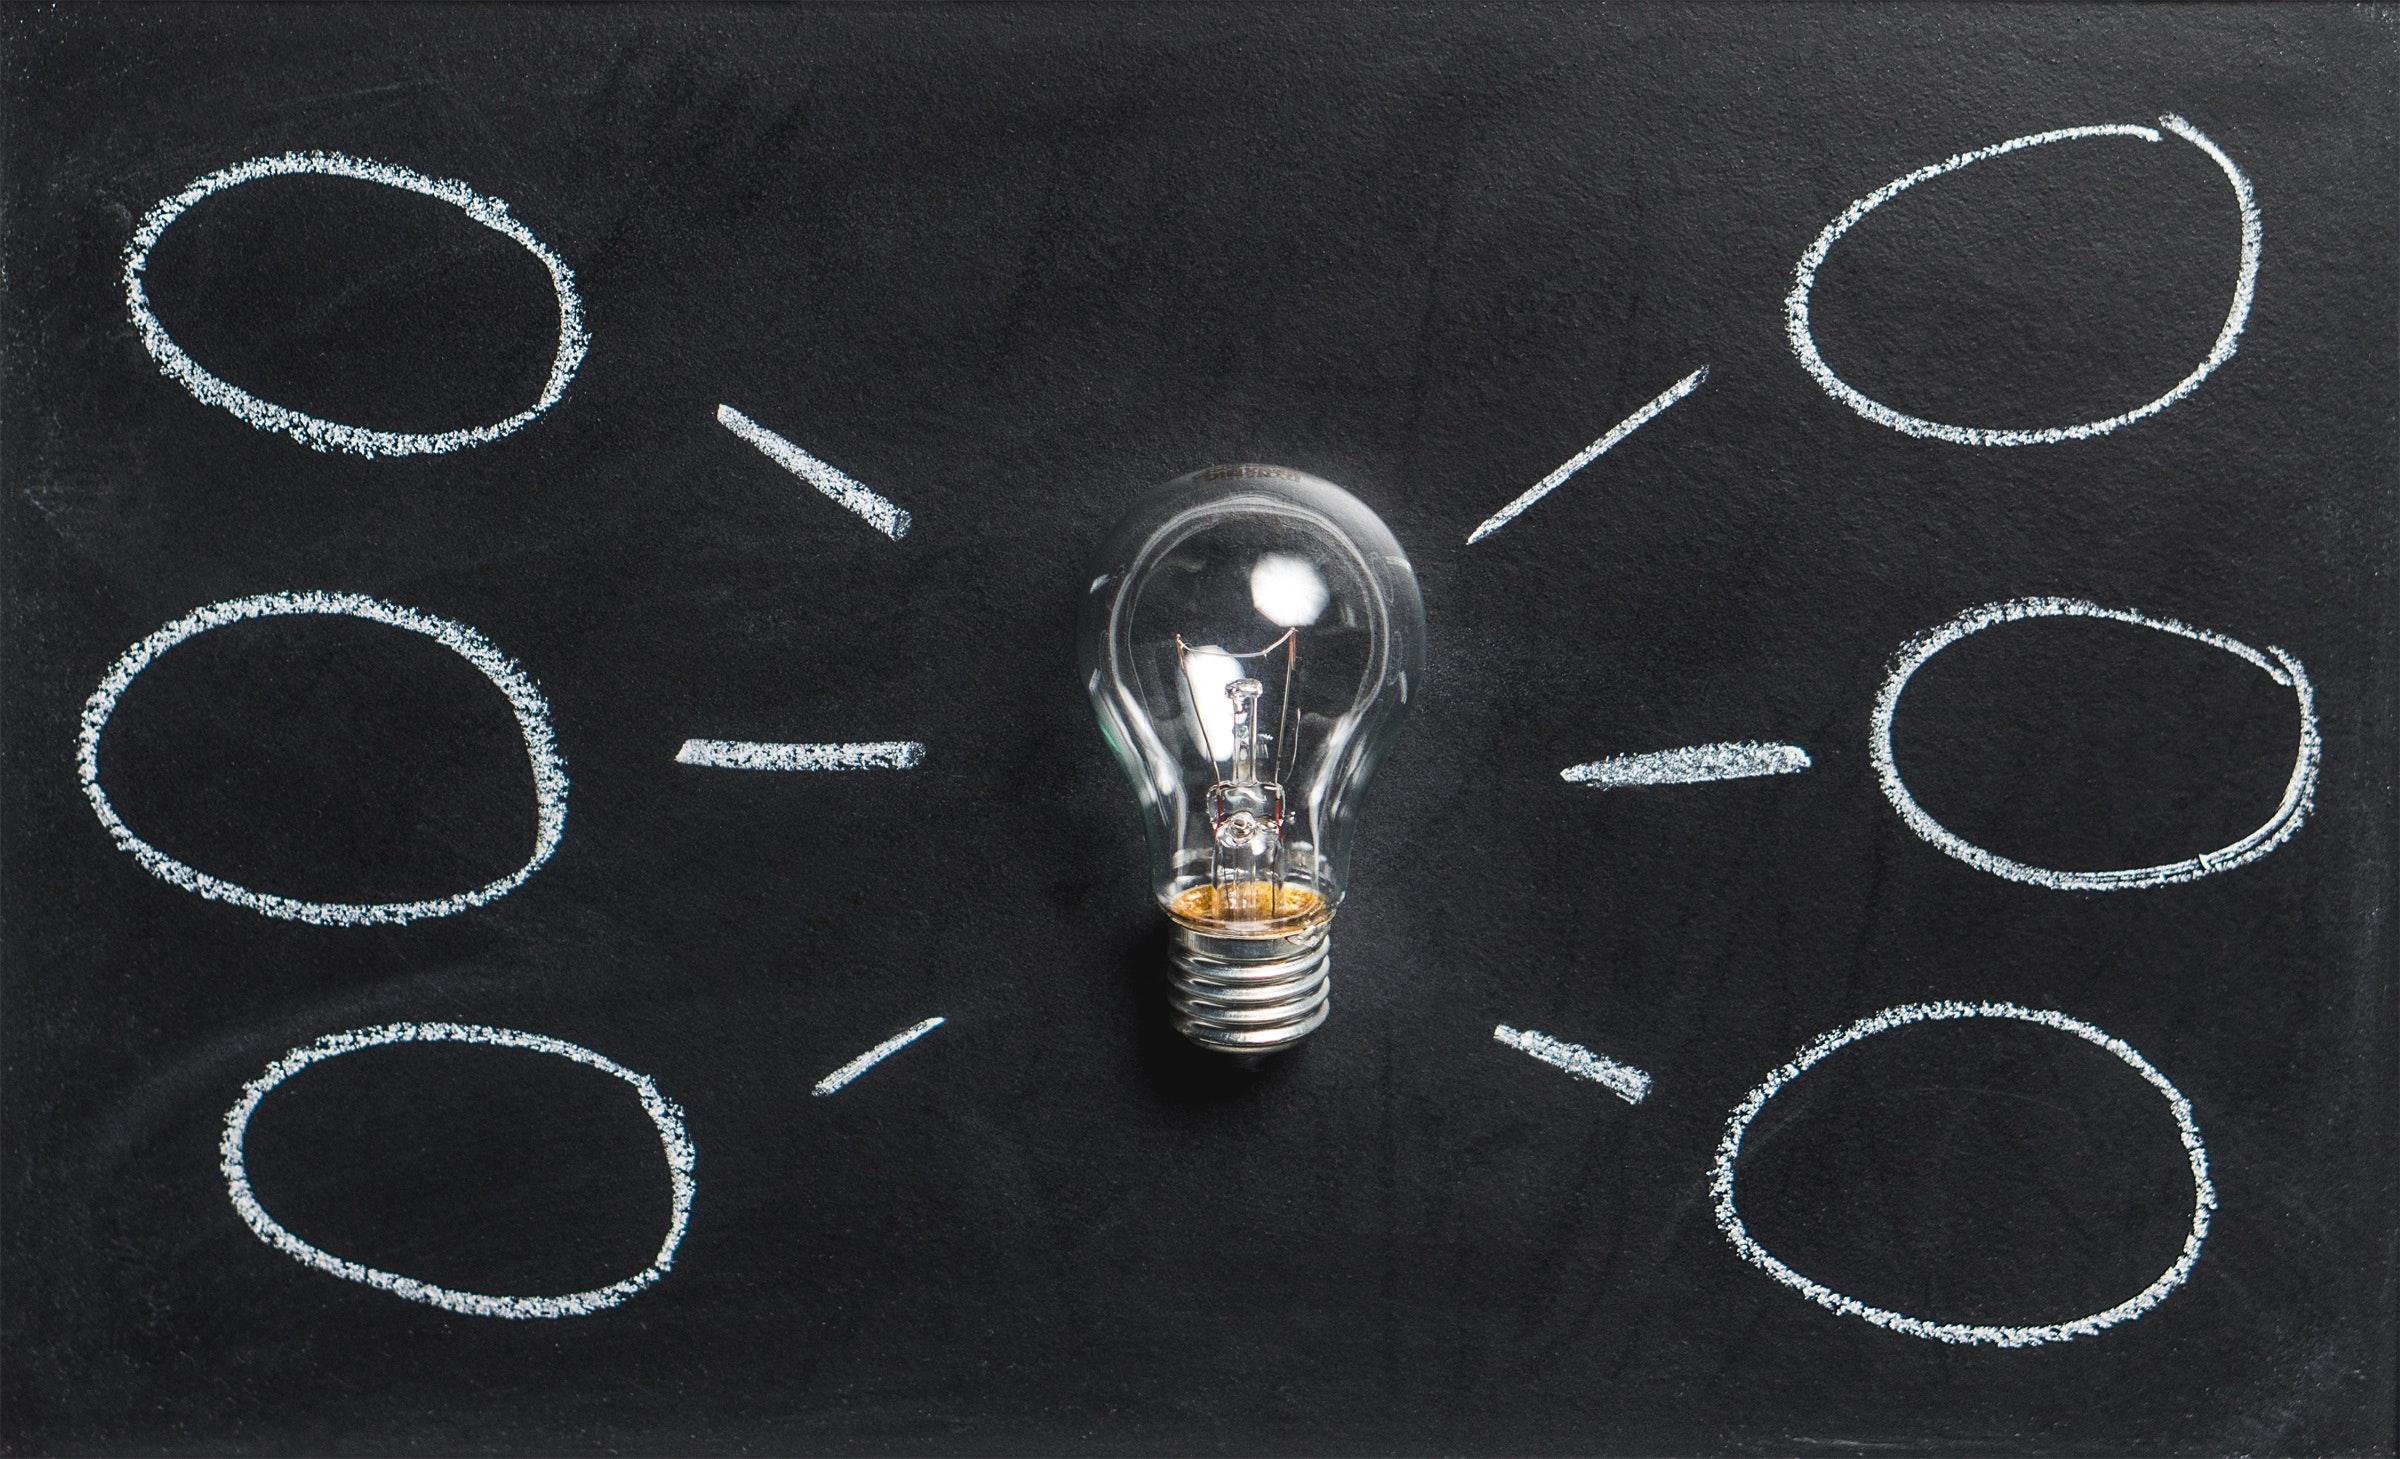 Collaborative Com Idea Bulb-355948.jpg